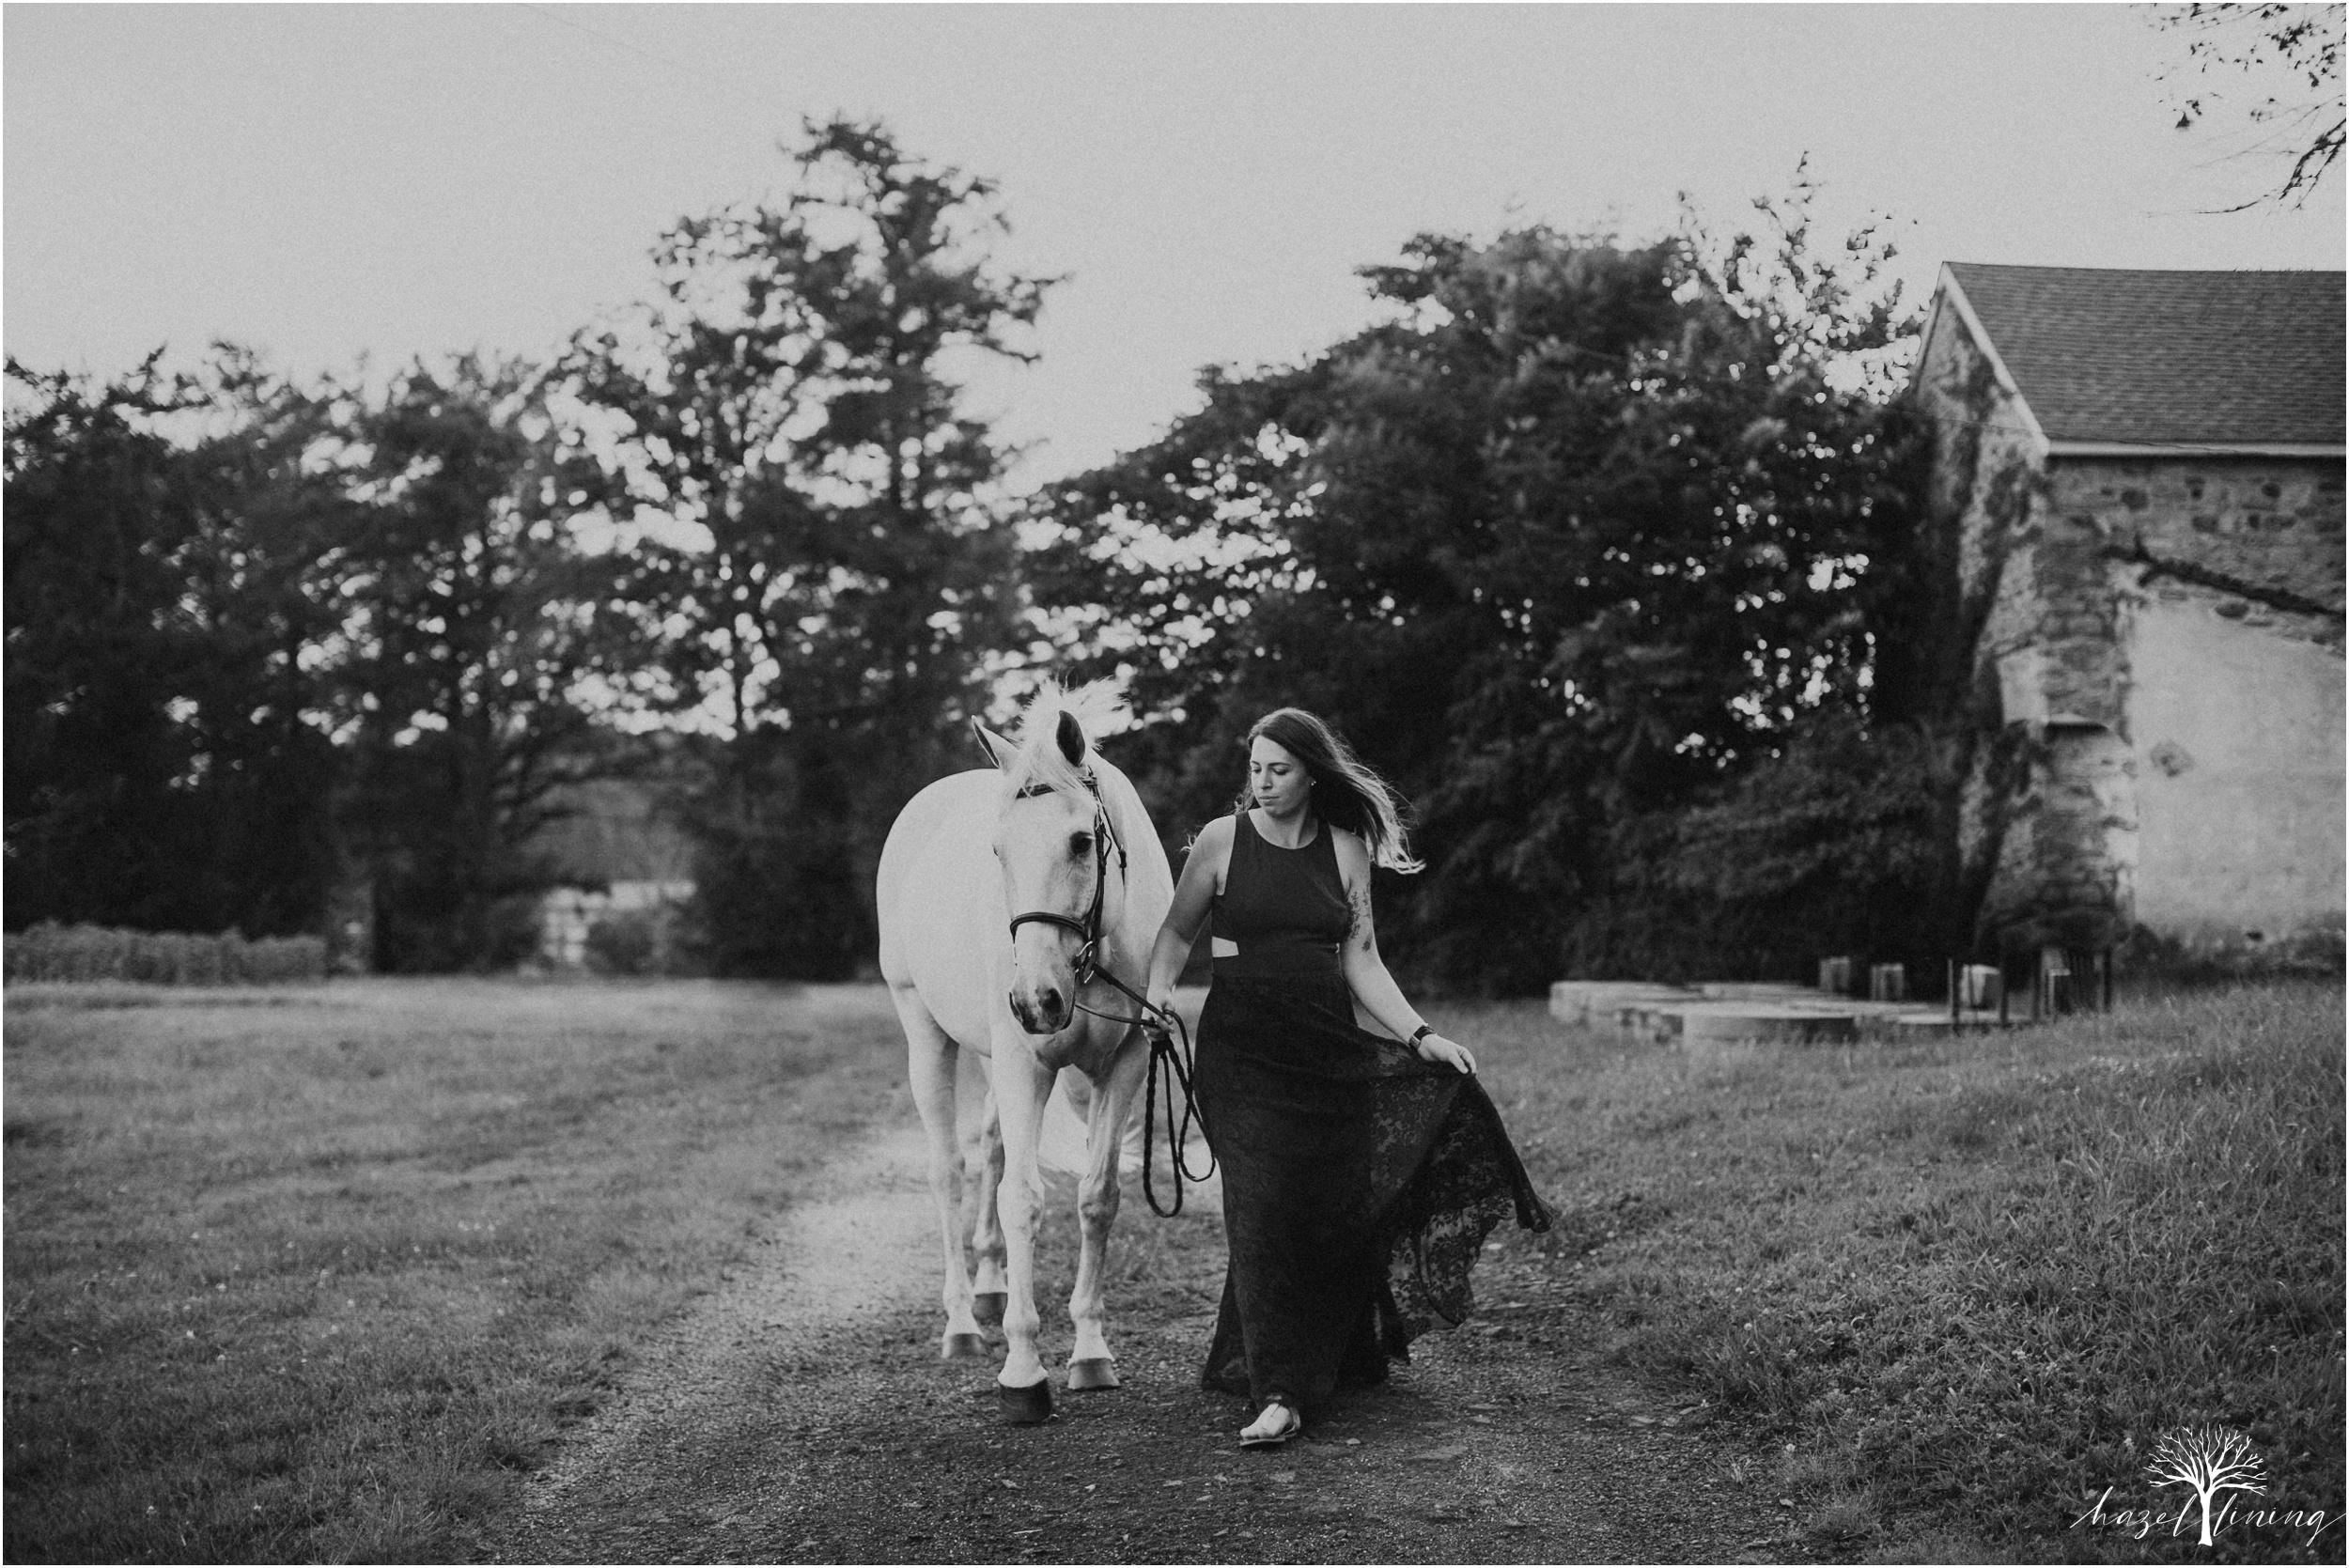 taylor-adams-and-horse-delaware-valley-university-delval-summer-equestrian-portrait-session-hazel-lining-photography-destination-elopement-wedding-engagement-photography_0061.jpg